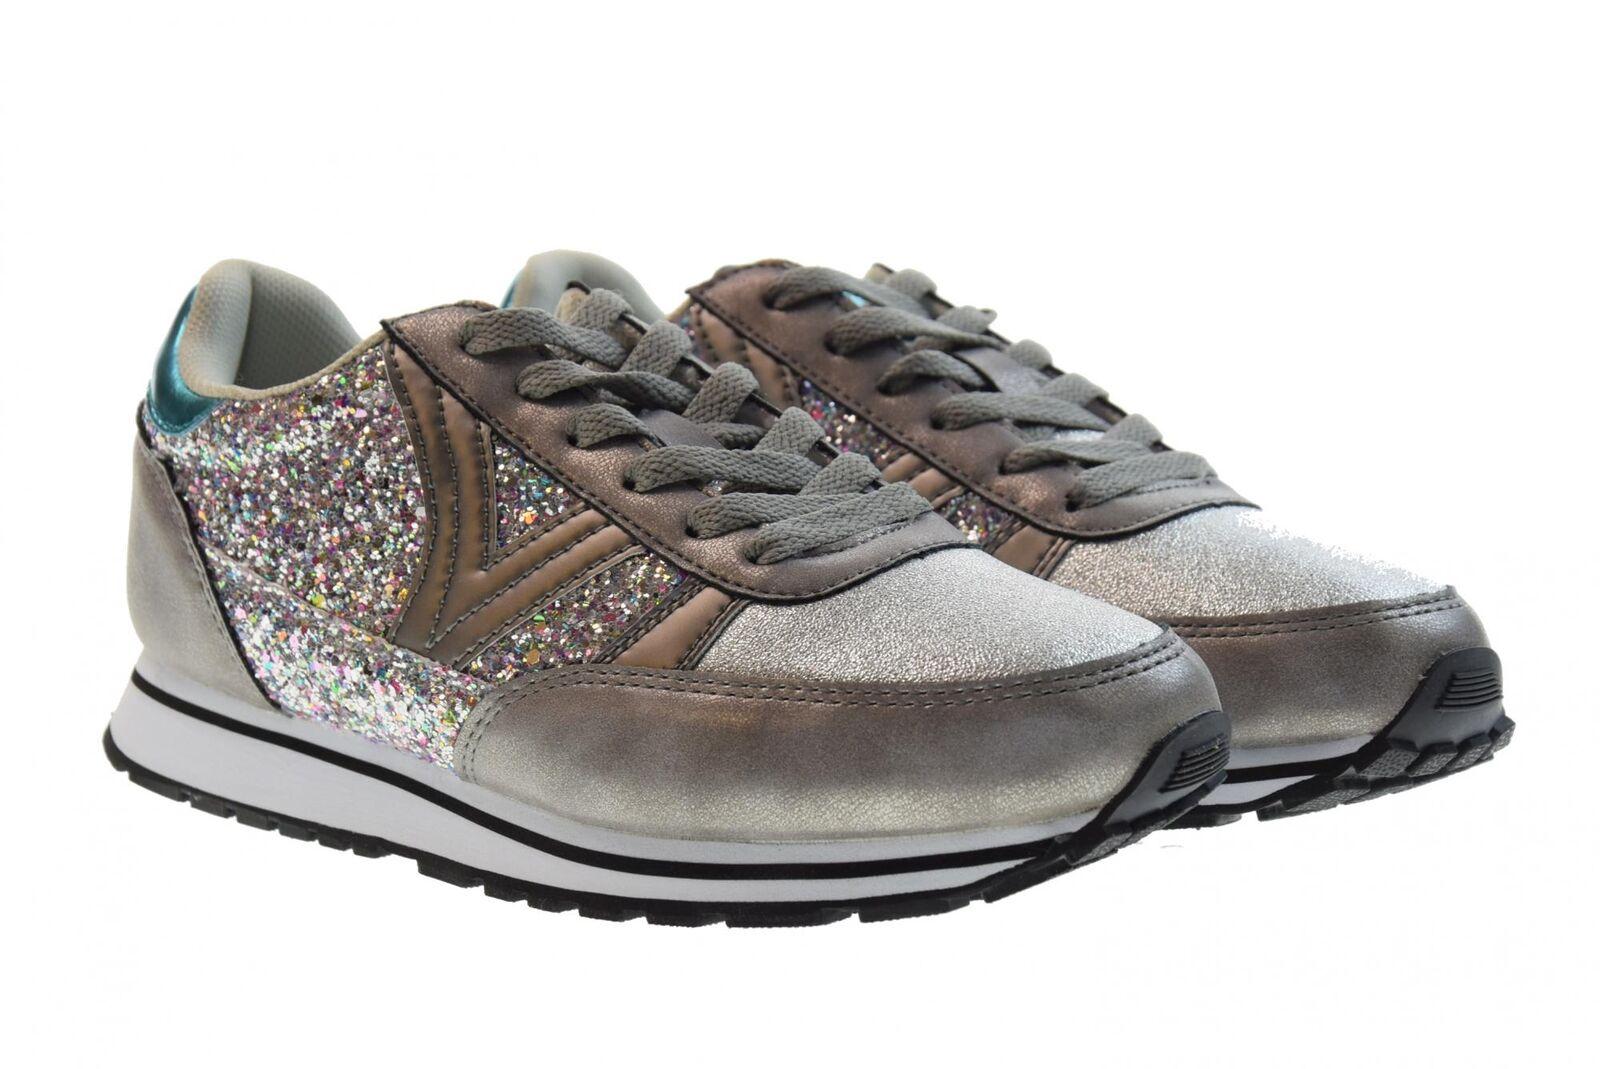 Victoria scarpe donna scarpe da ginnastica basse 141113 argentoO P19